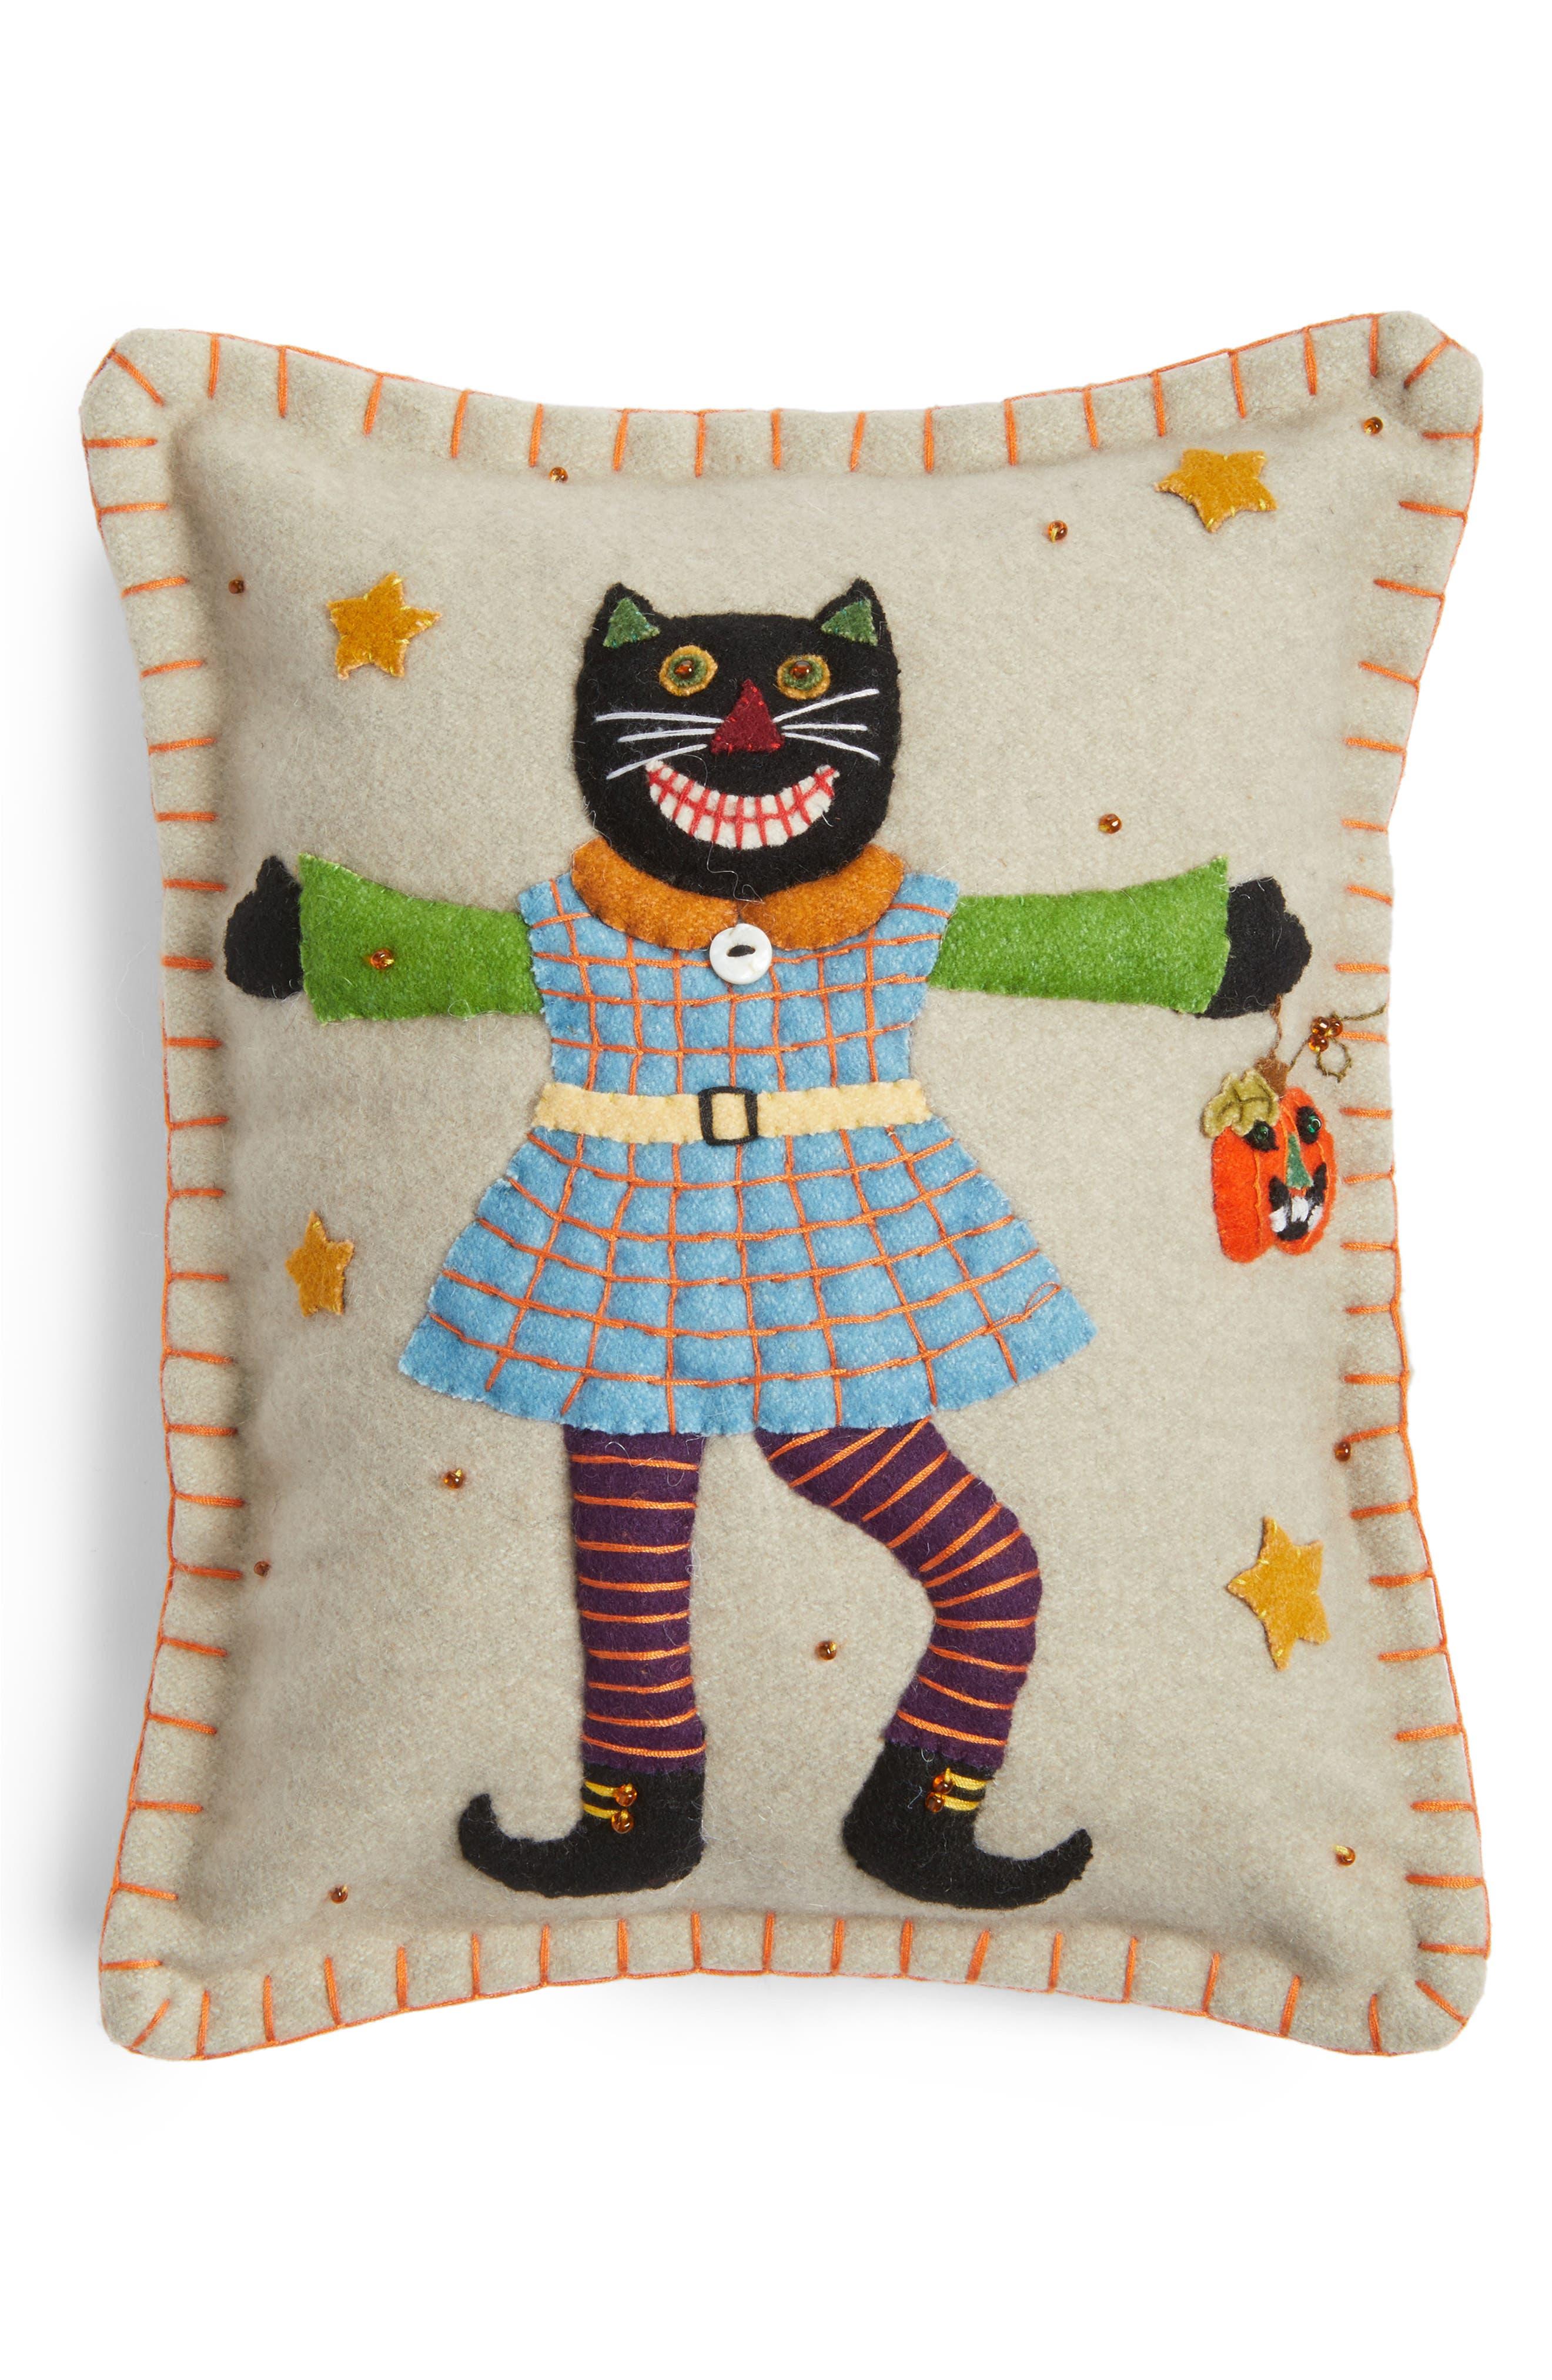 New World Arts Black Cat Accent Pillow